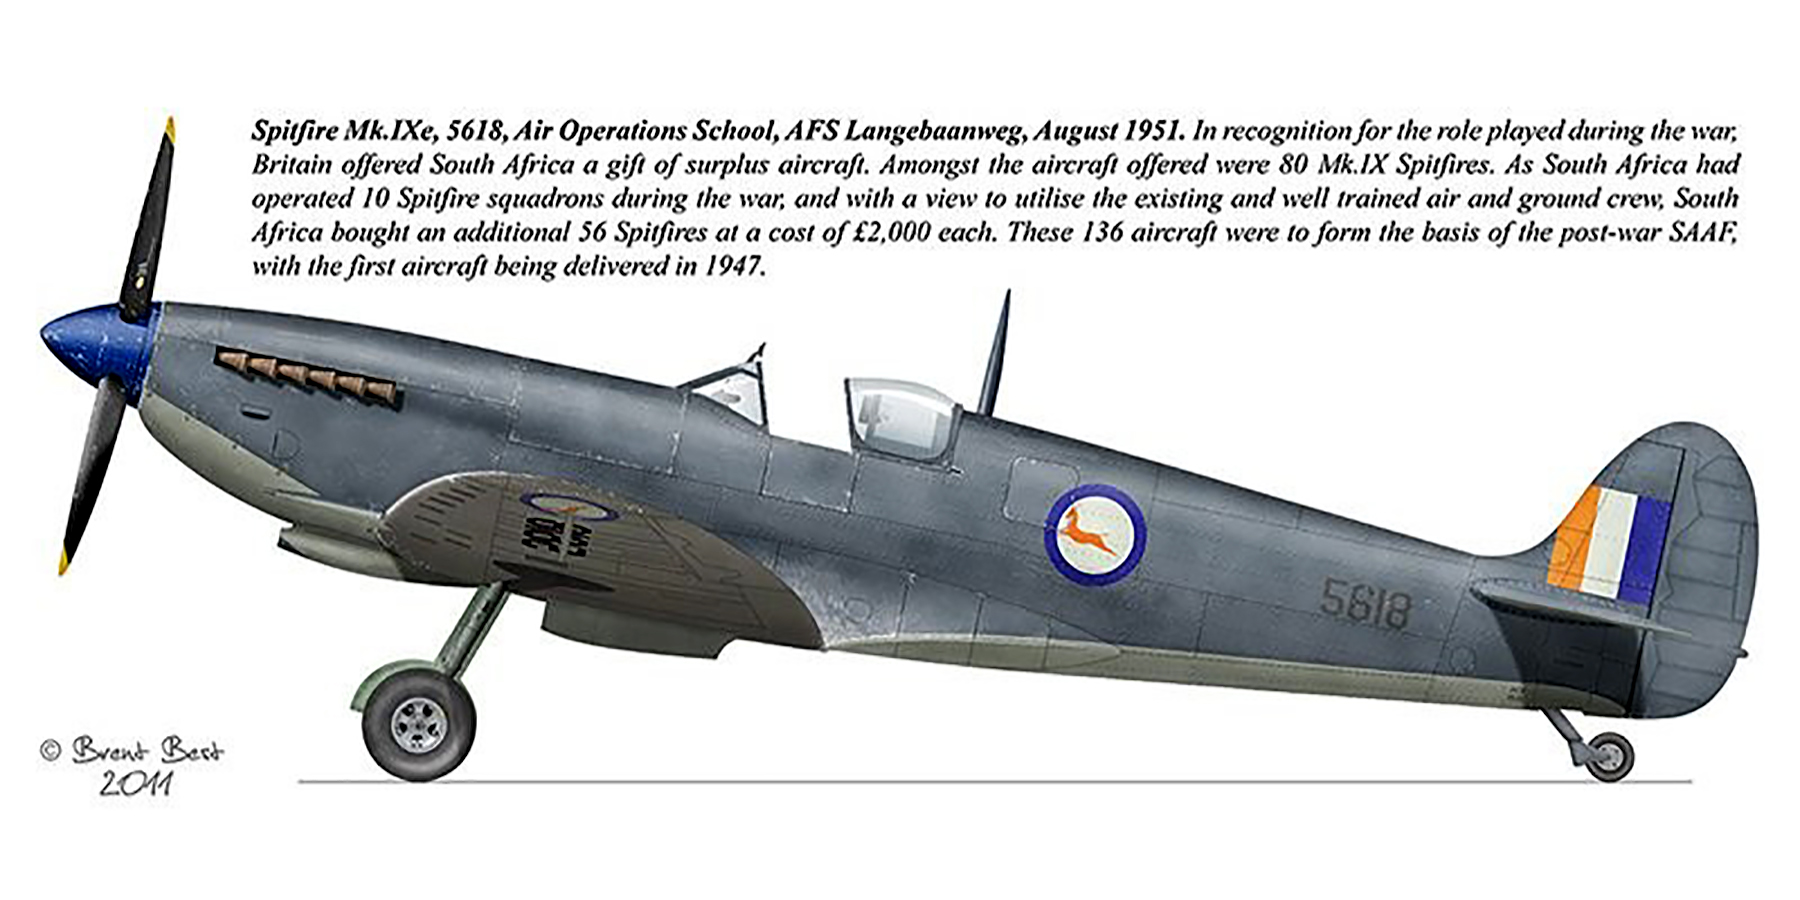 Spitfire MkIX SAAF AFS 5618 Langebaanweg Aug 1951 0A